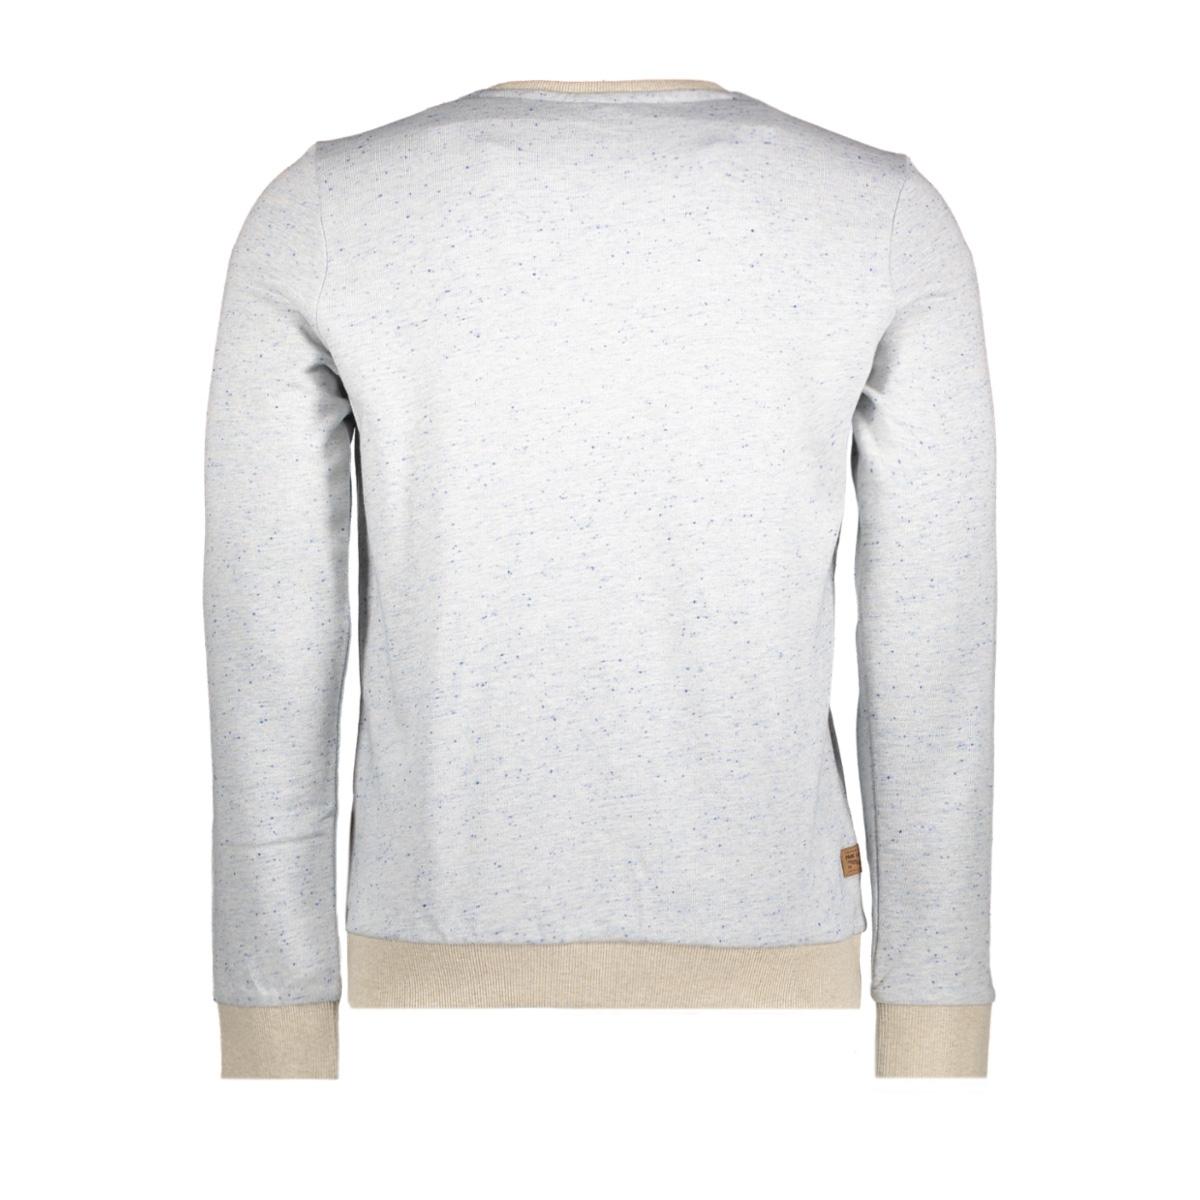 pts178523 pme legend sweater 9001